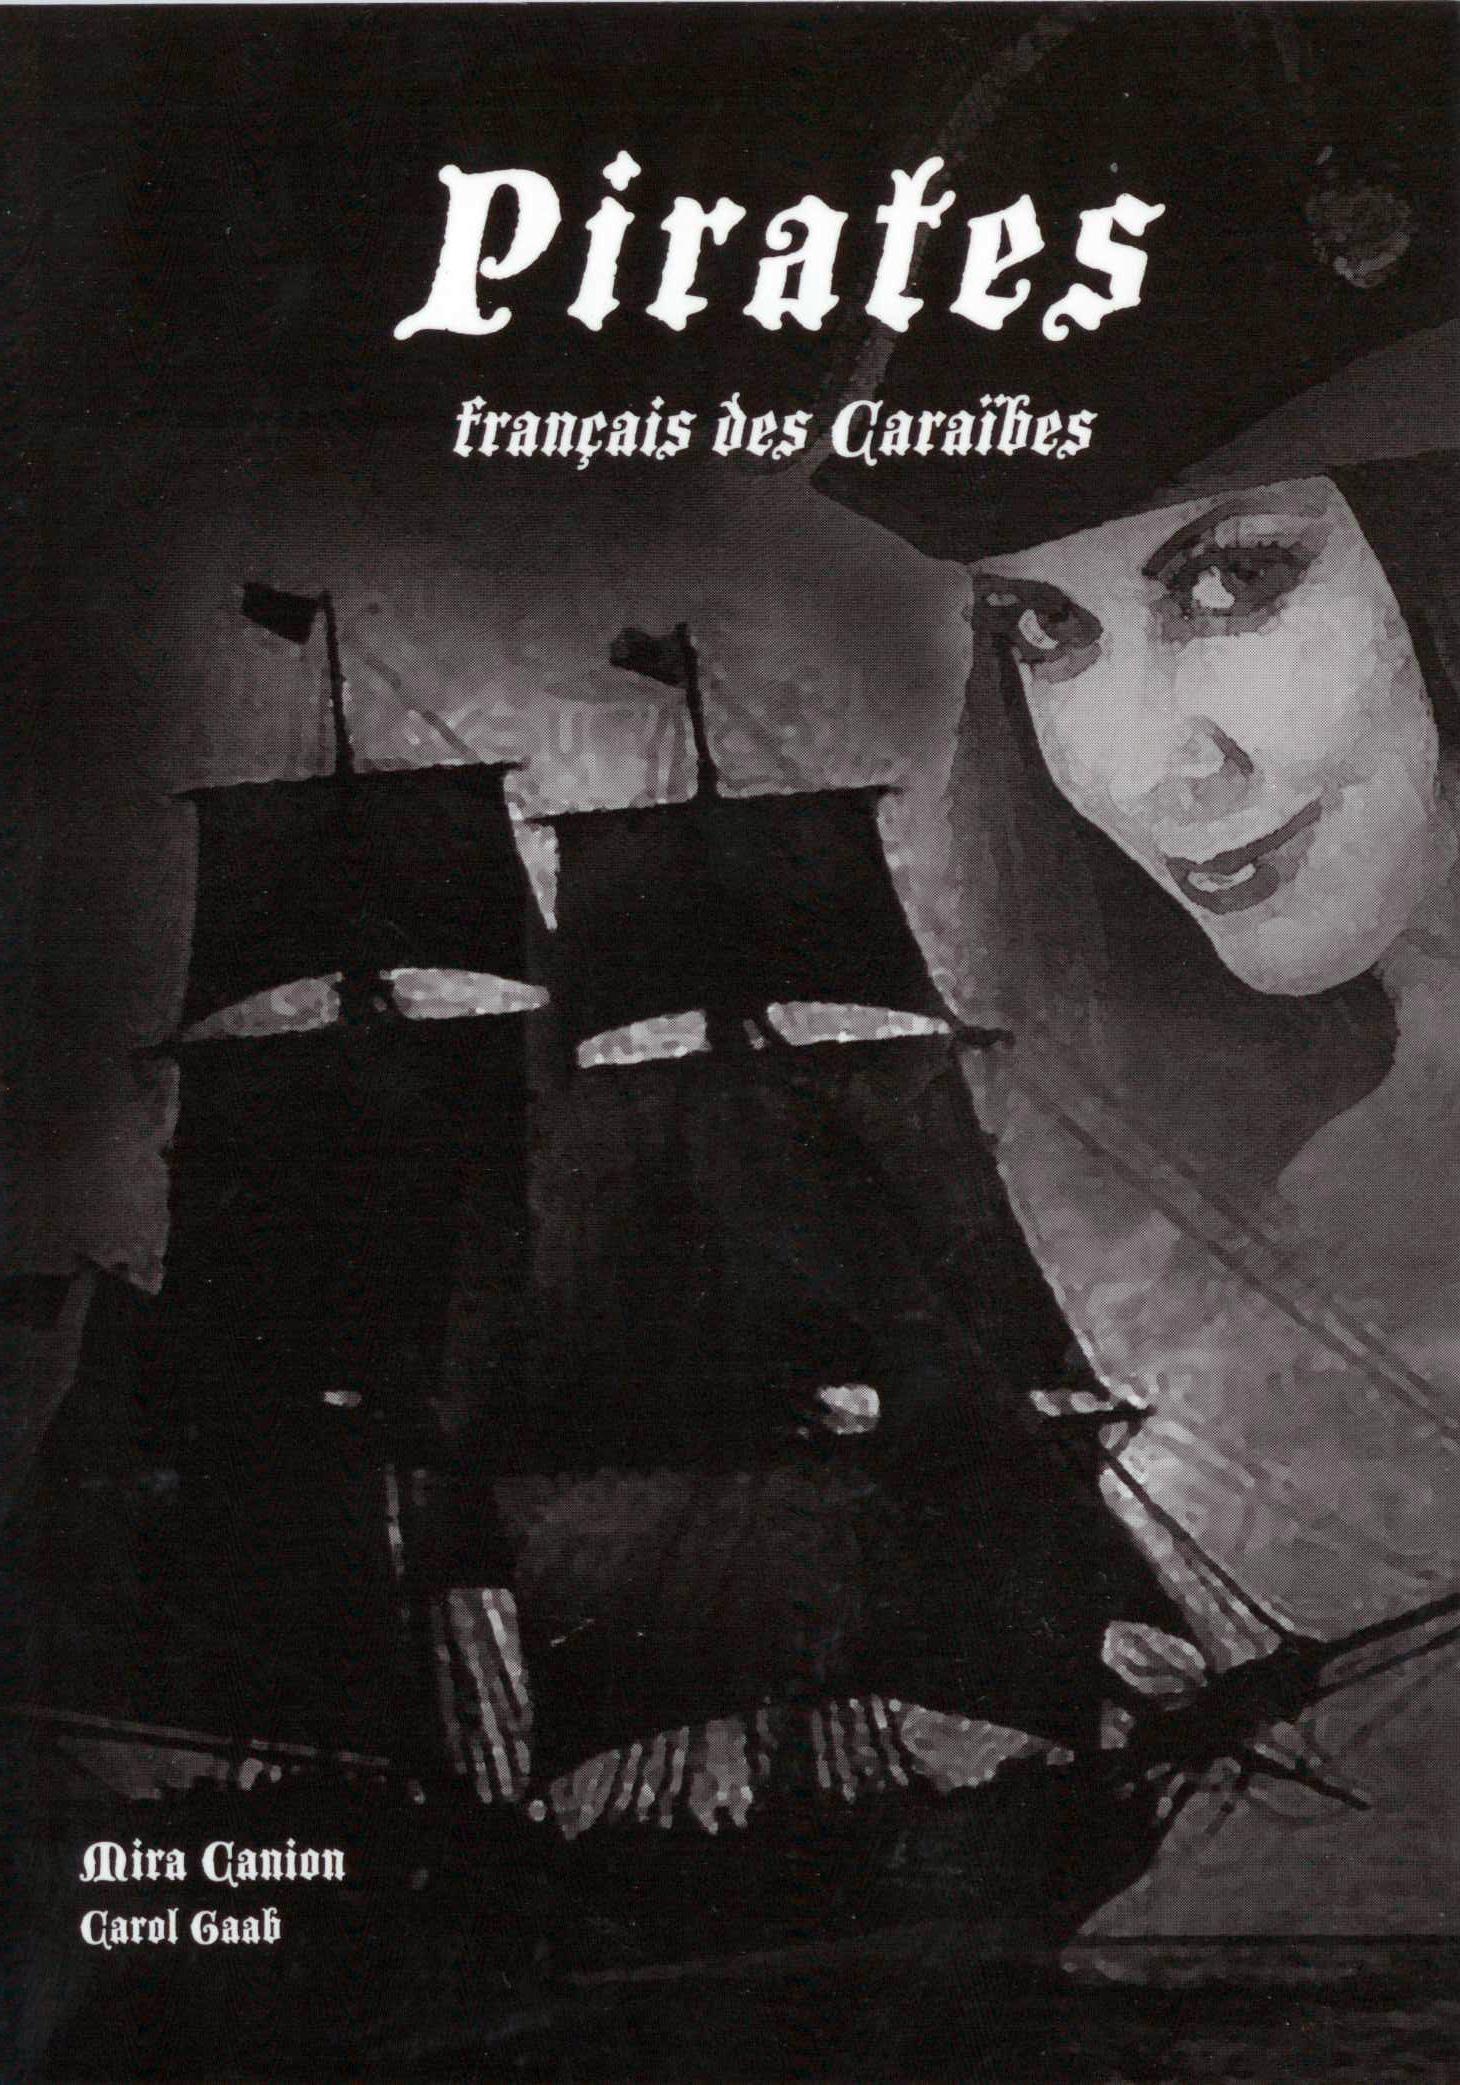 Pirates_francais_des_caraibes